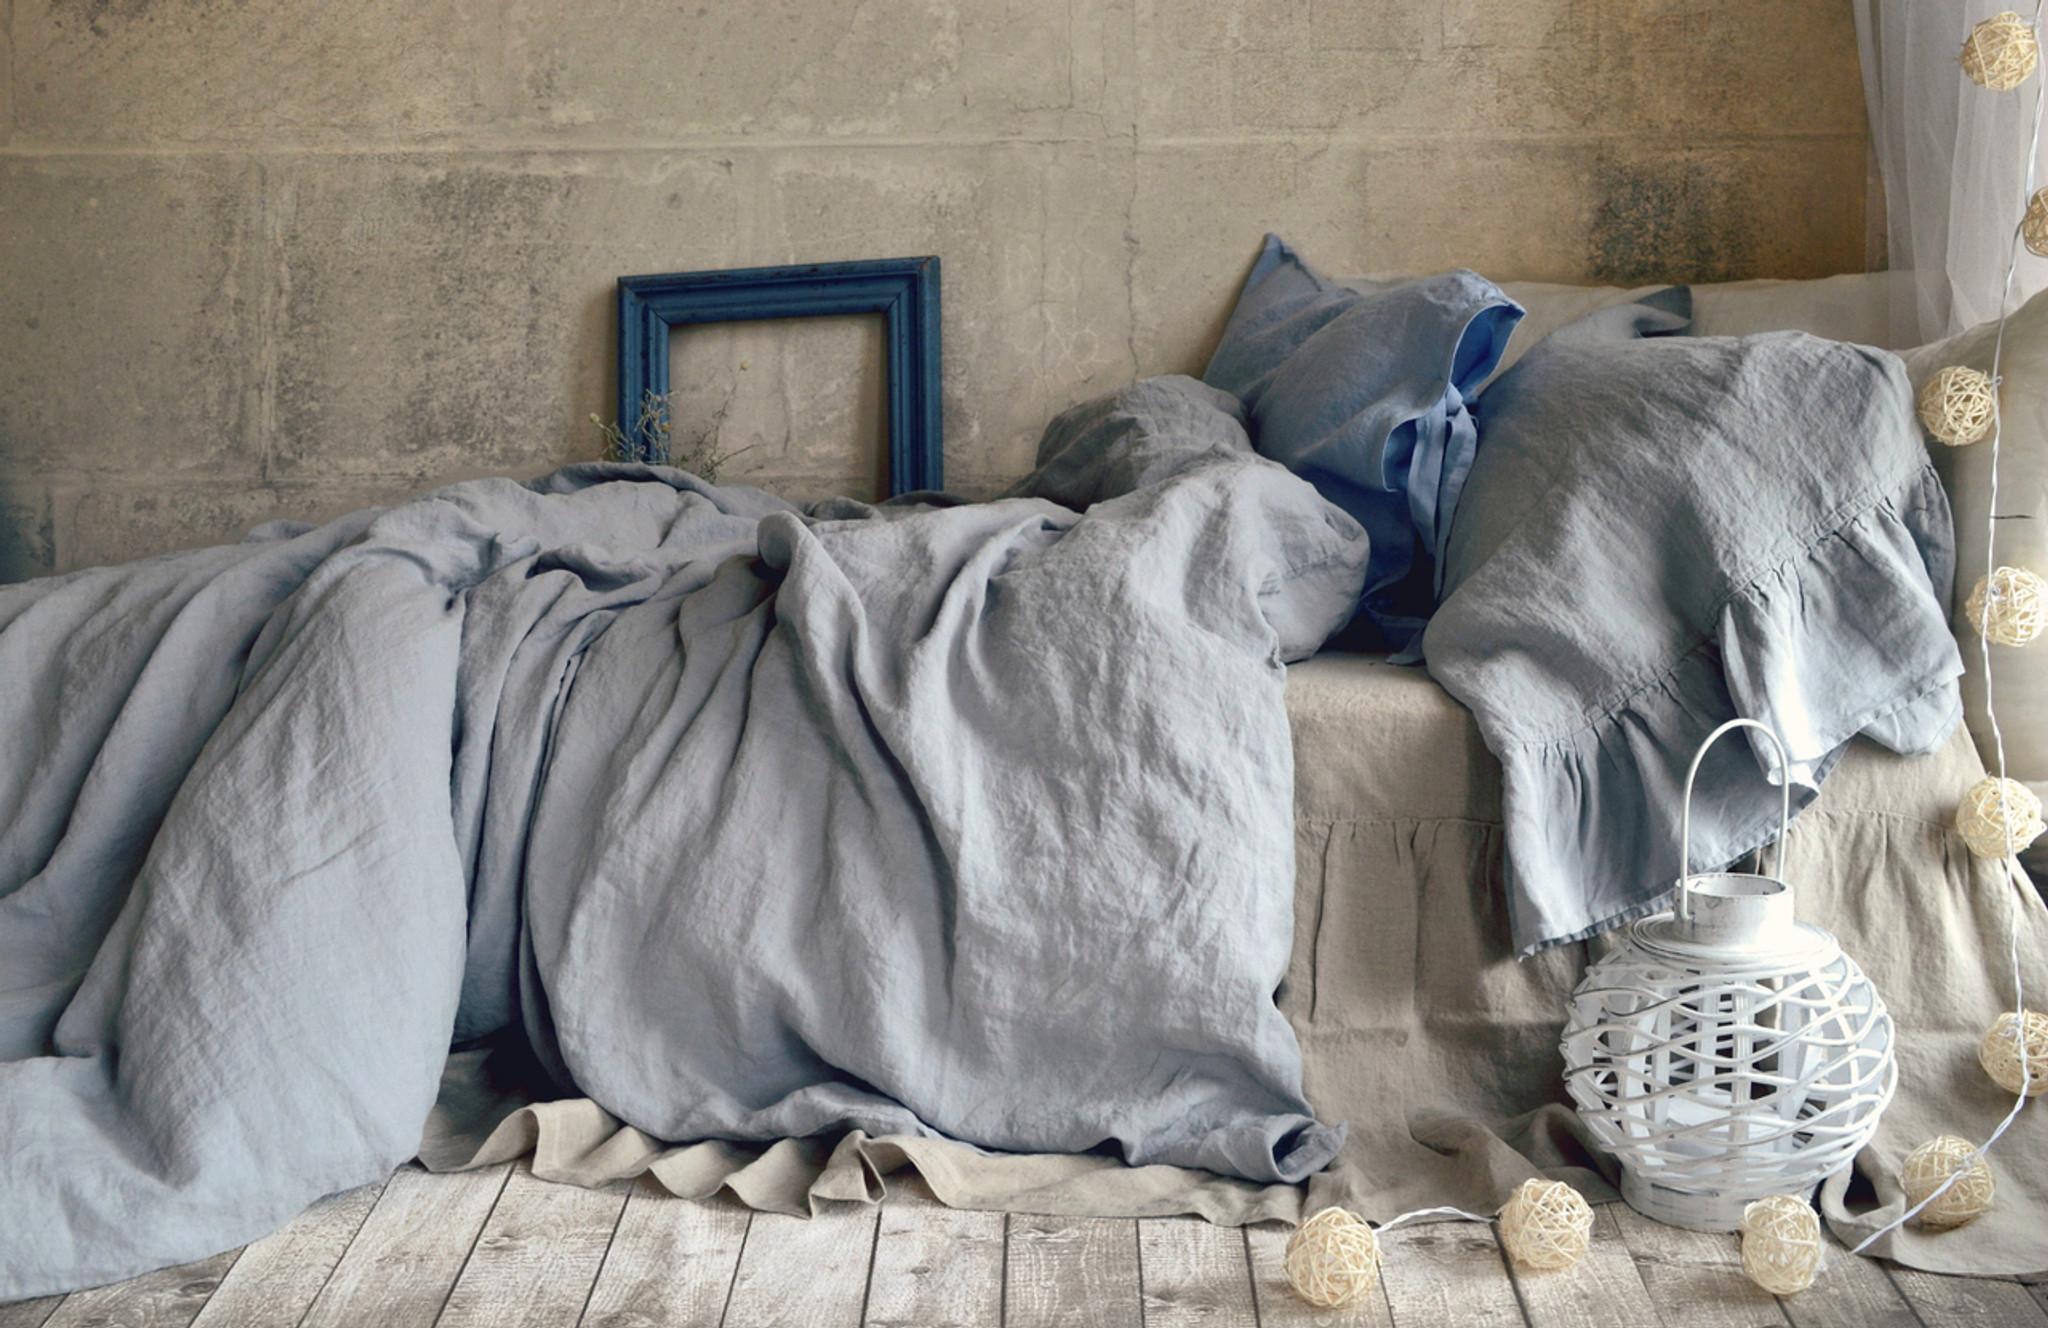 European Style Closure Pillow Cases